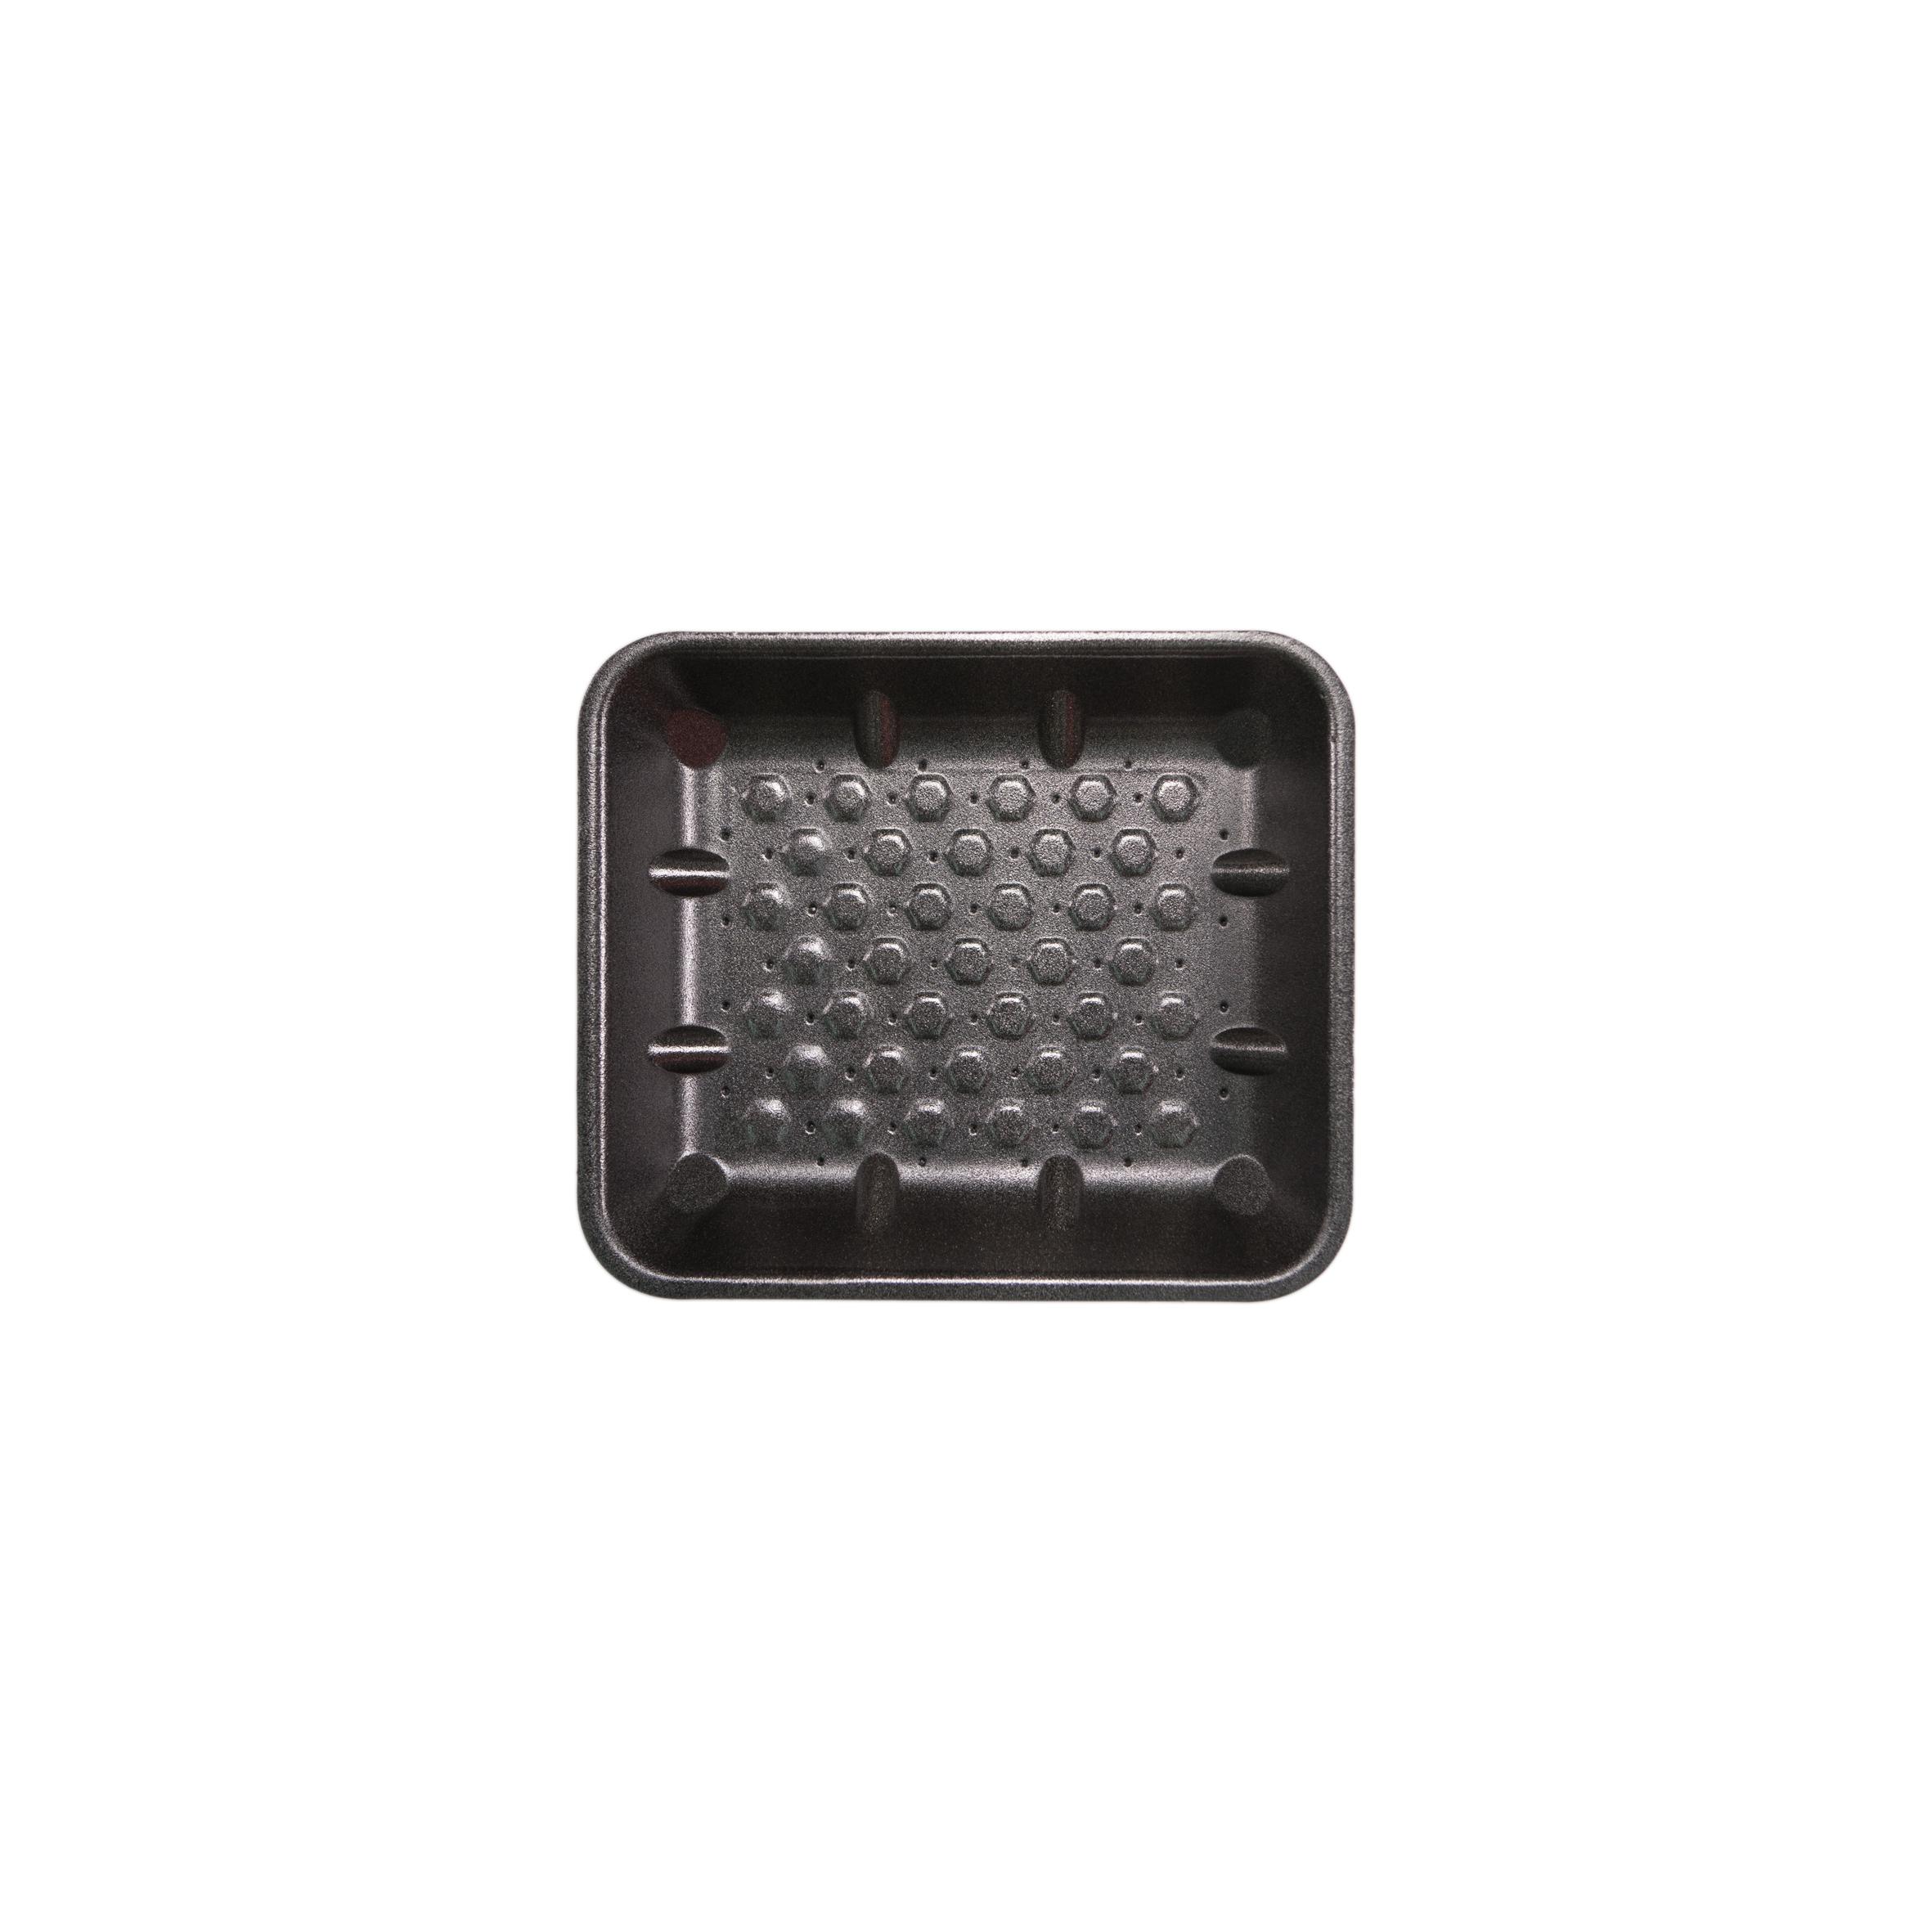 iK0105      OPEN CELL 35mm 8x7    90 per sleeve 360 per carton